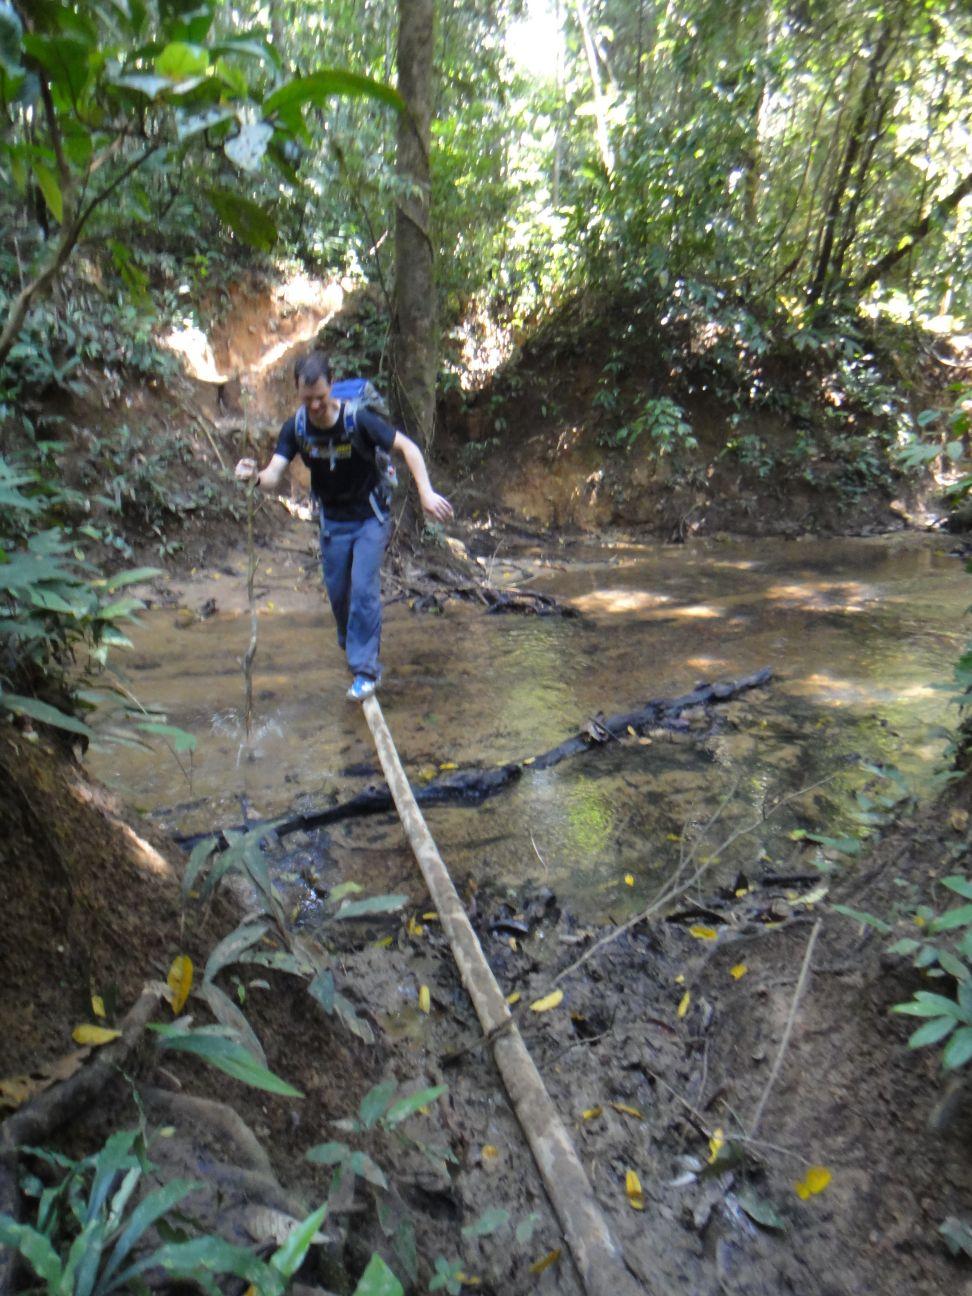 bit muddy in places